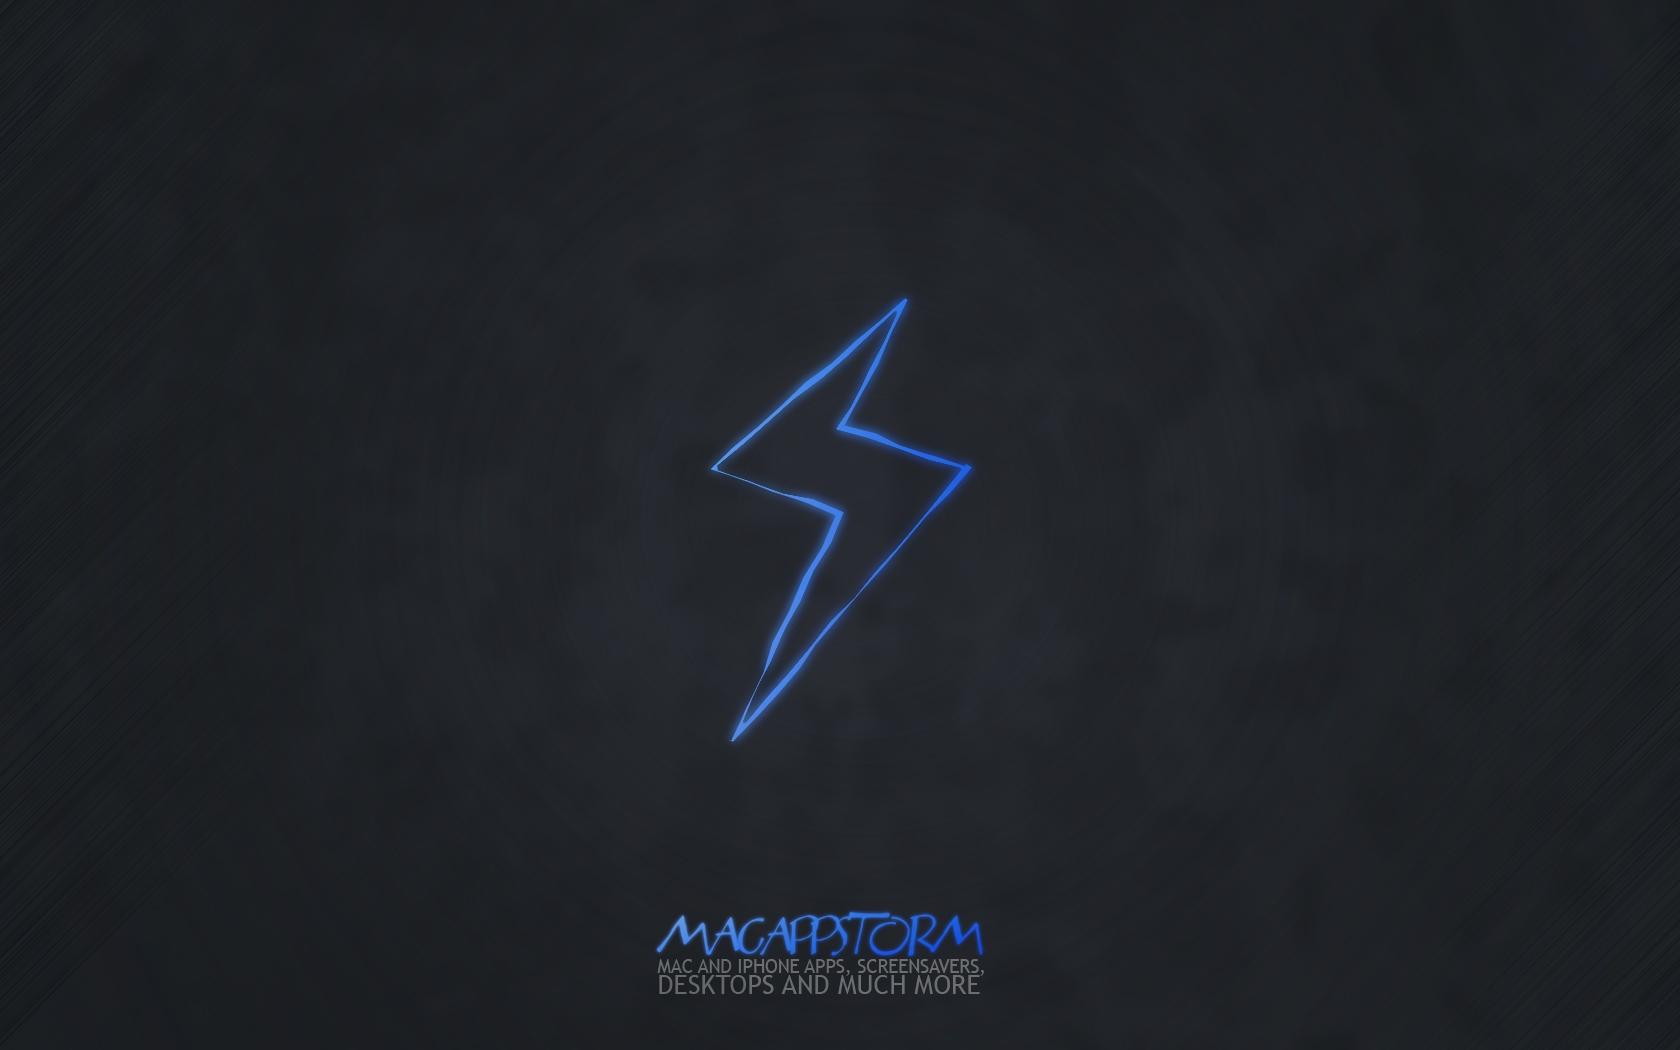 Sfondi Nero Cielo Logo Fulmine Triangolo Marca Mela Linea